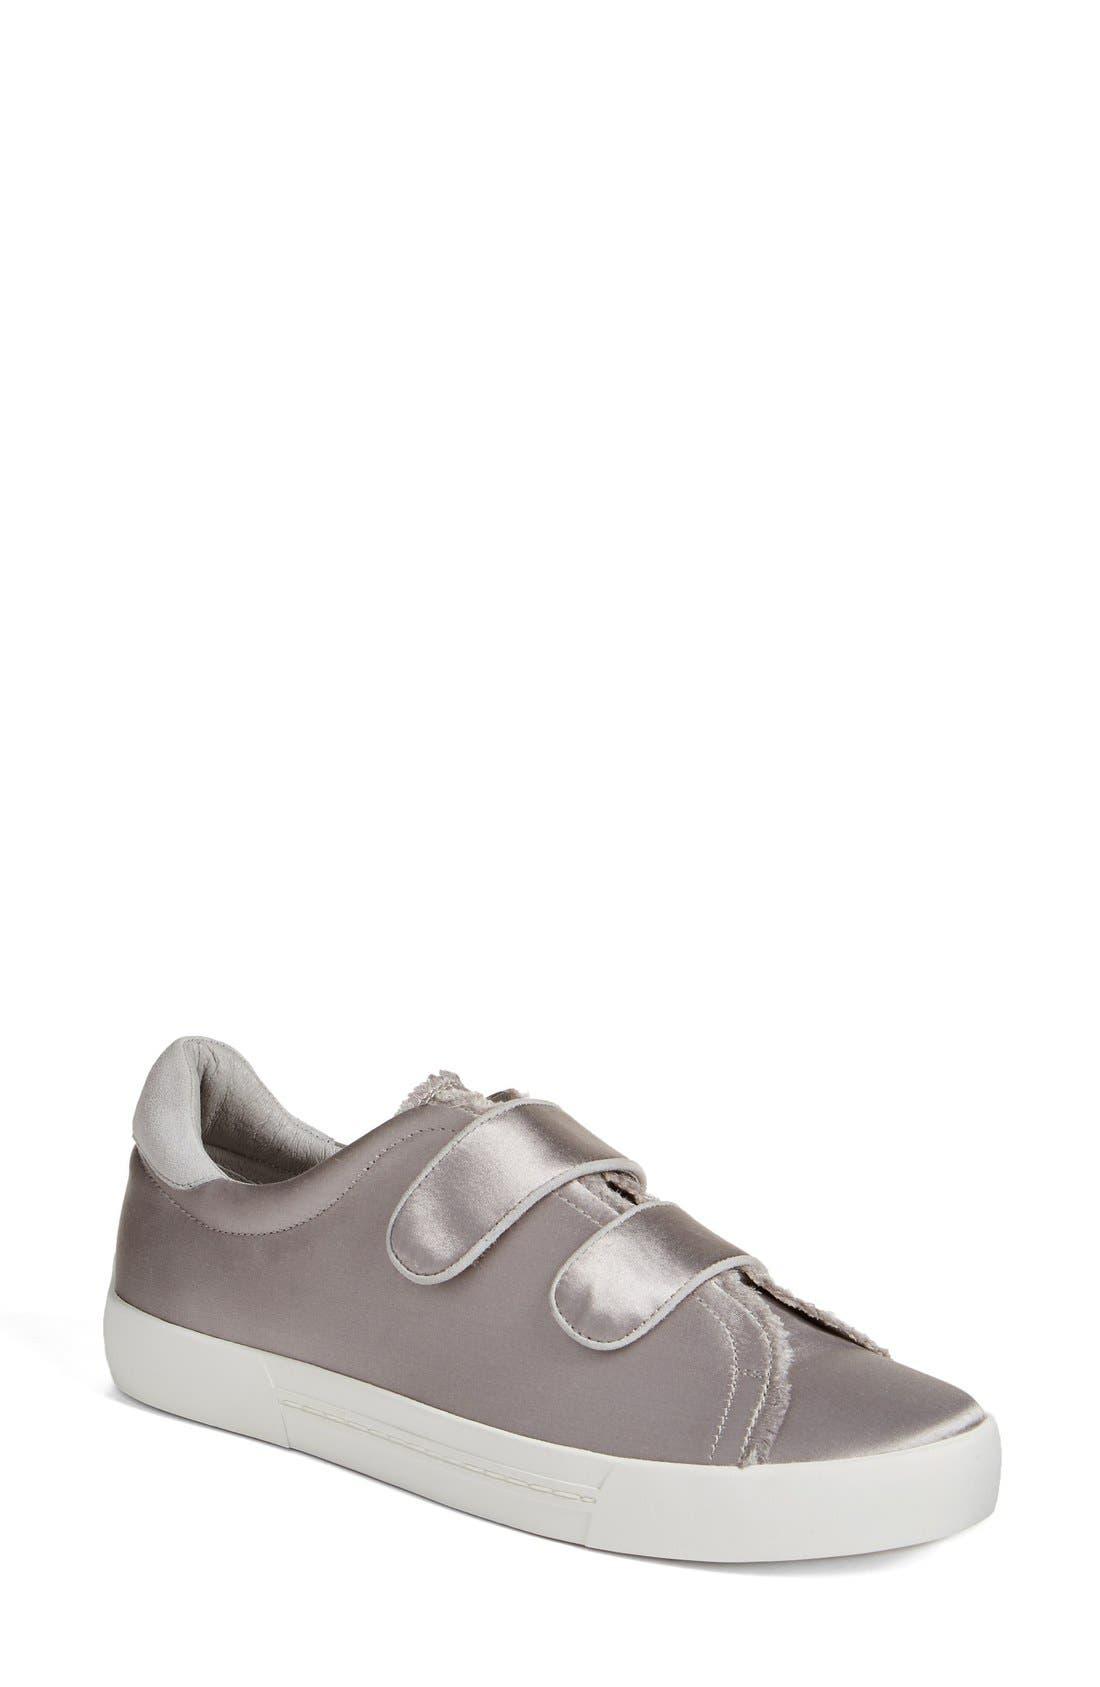 Alternate Image 1 Selected - Joie 'Diata' Low Top Sneaker (Women)